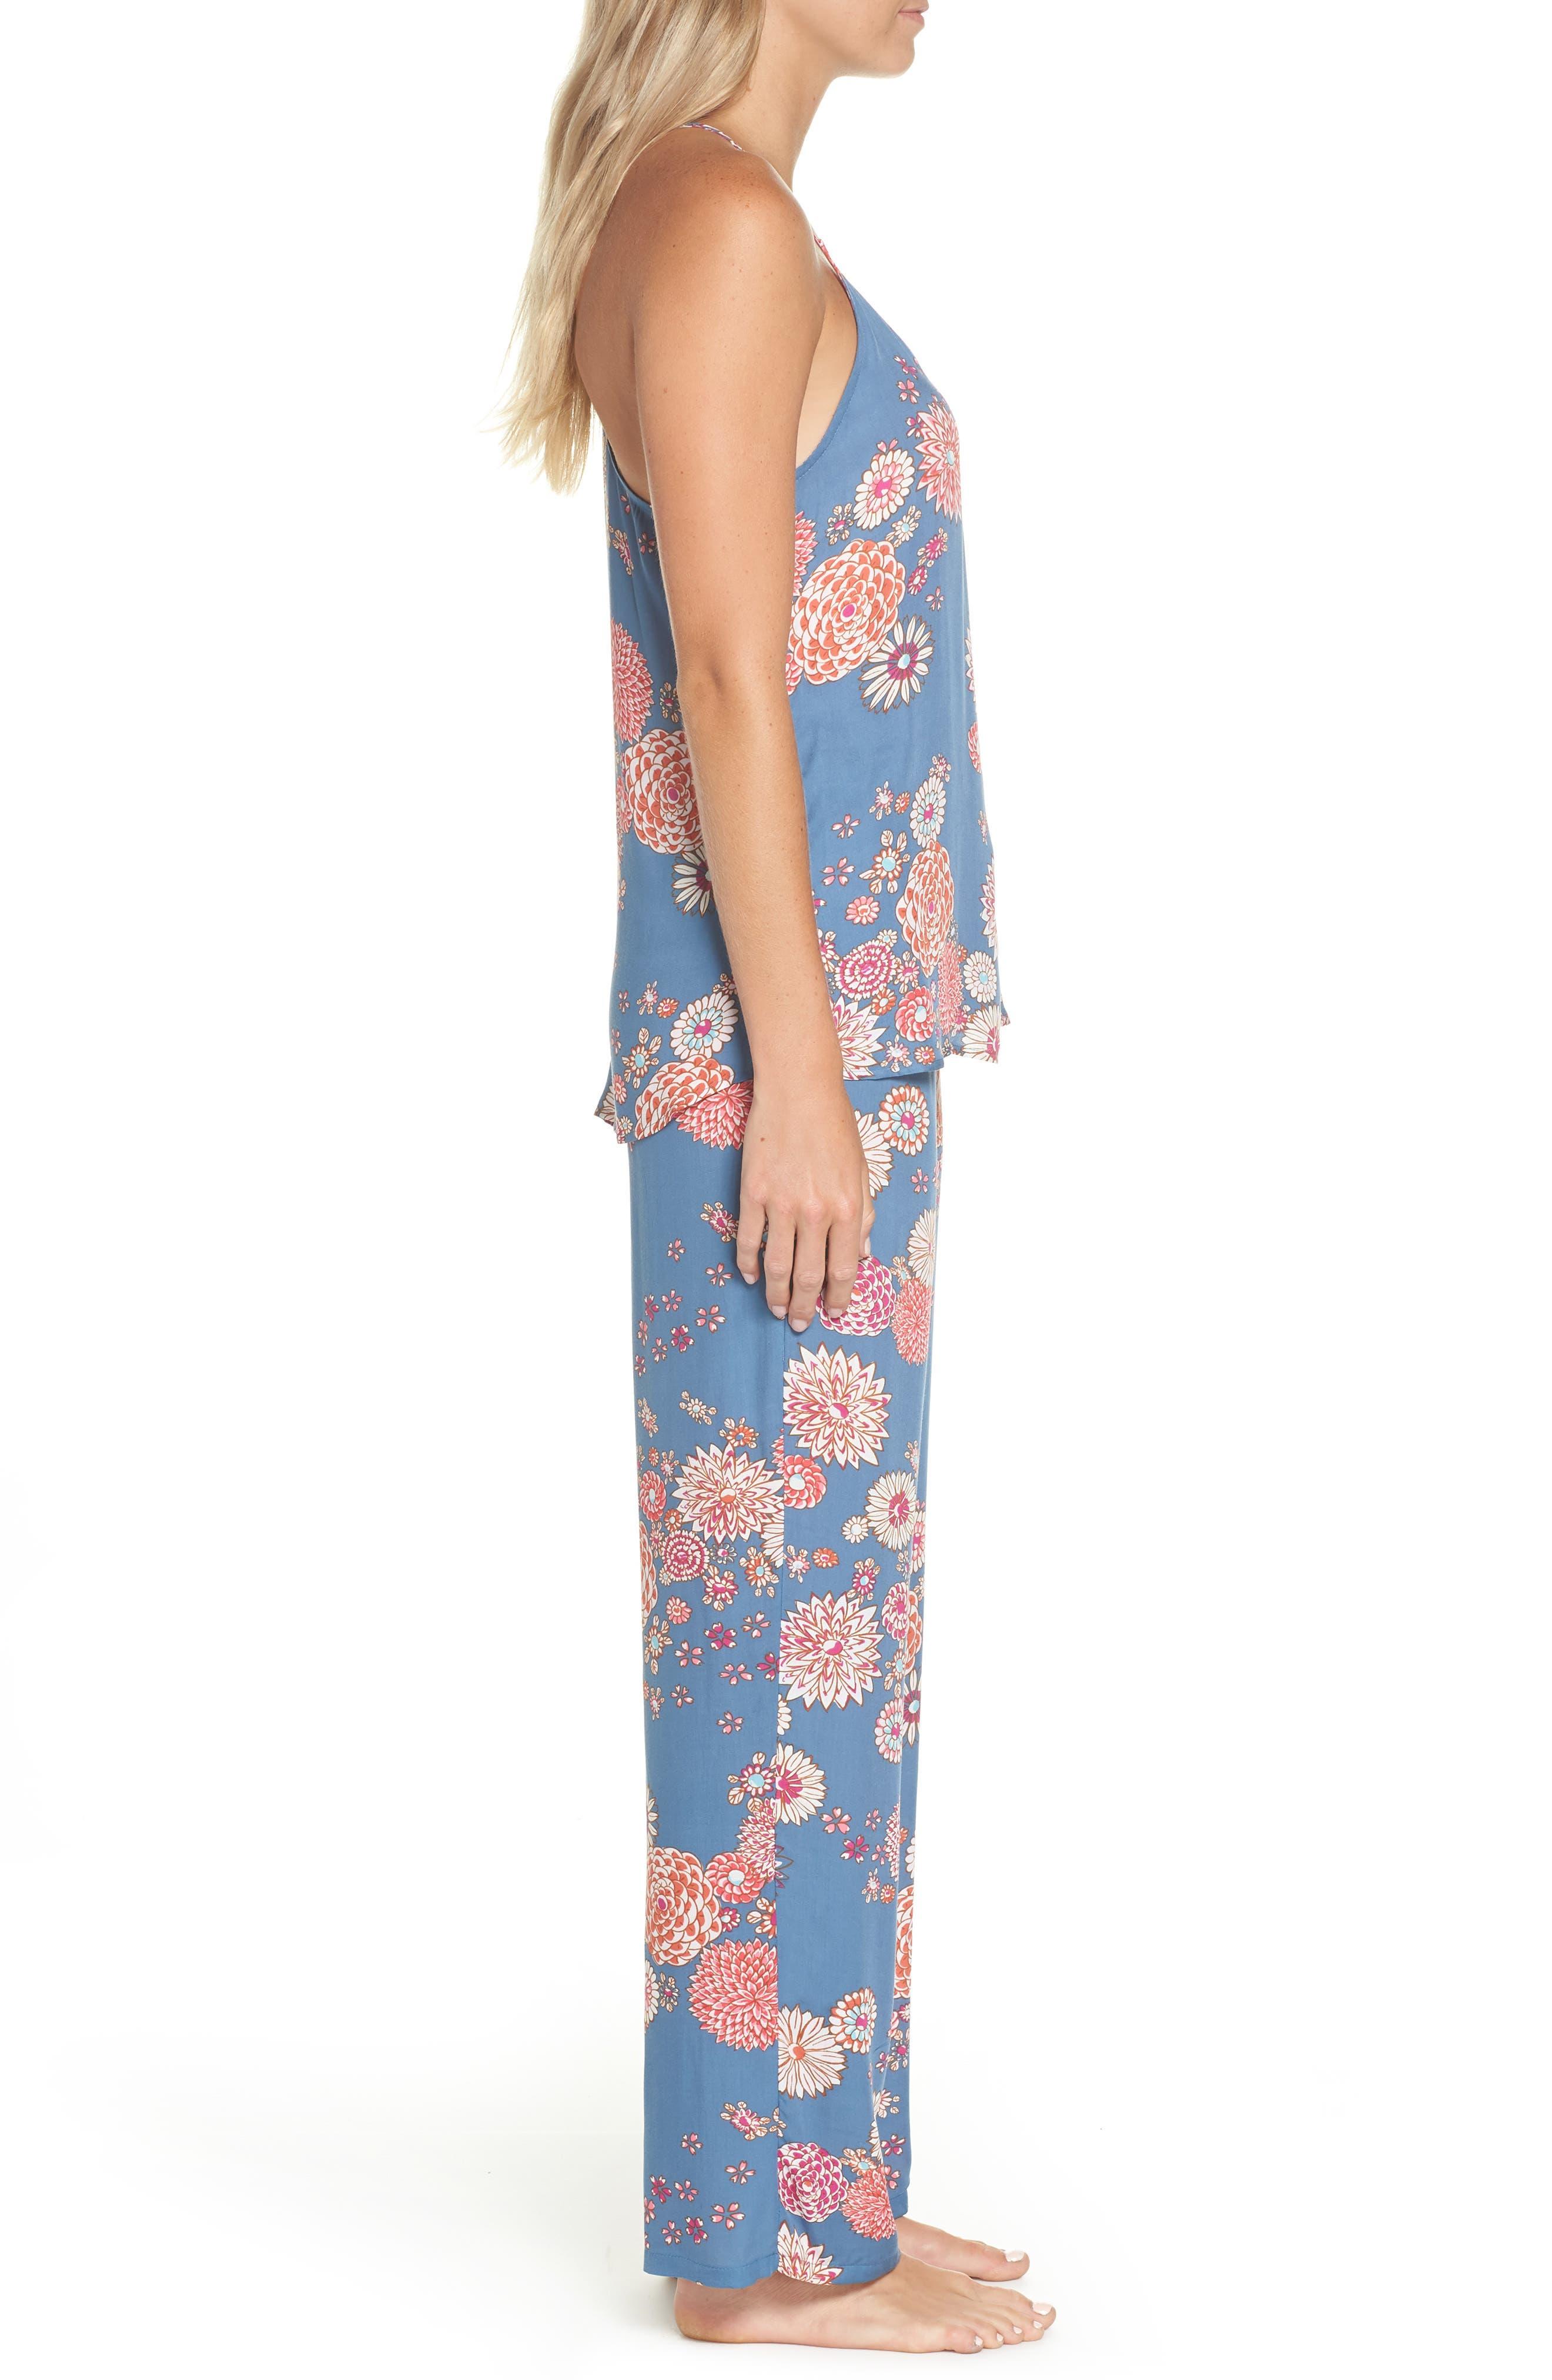 Floral Pajamas,                             Alternate thumbnail 3, color,                             Steallar Blue